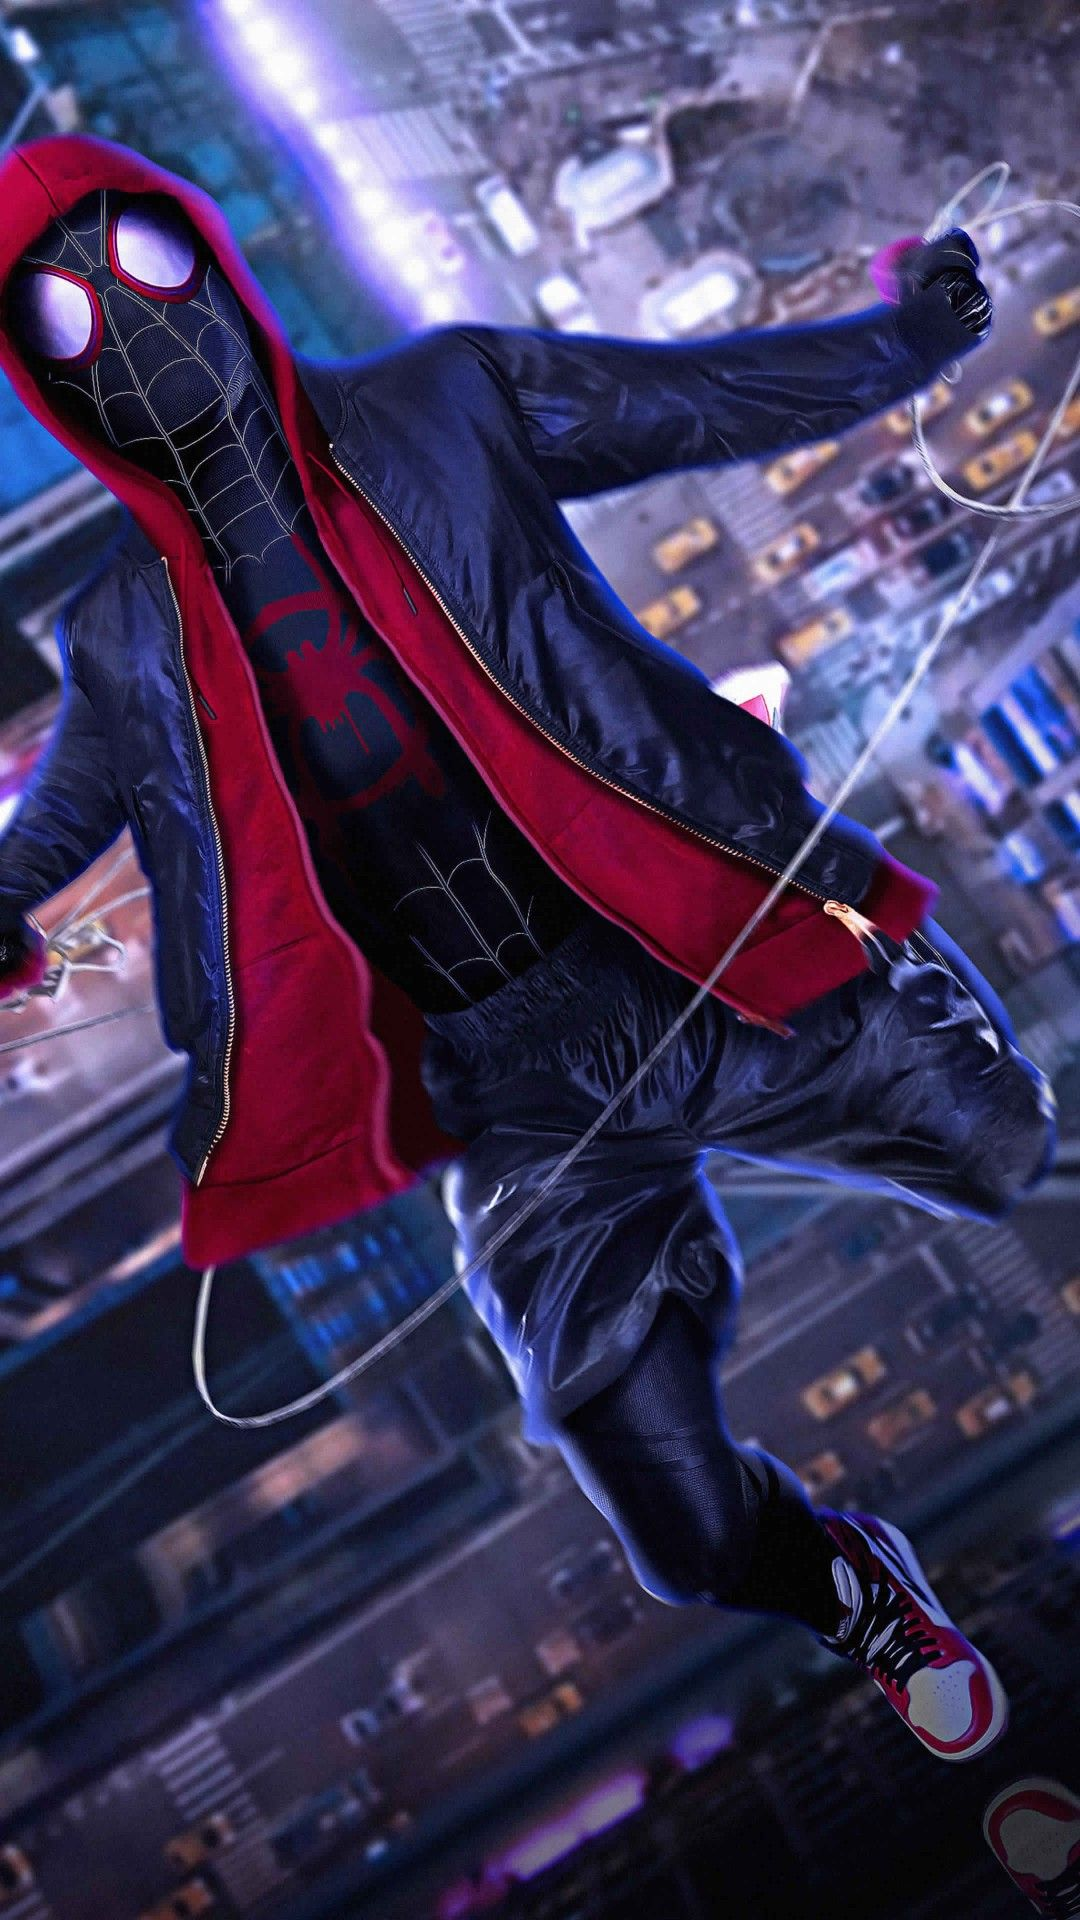 Spider-Verse | Verses wallpaper, Spider verse, Avengers ...